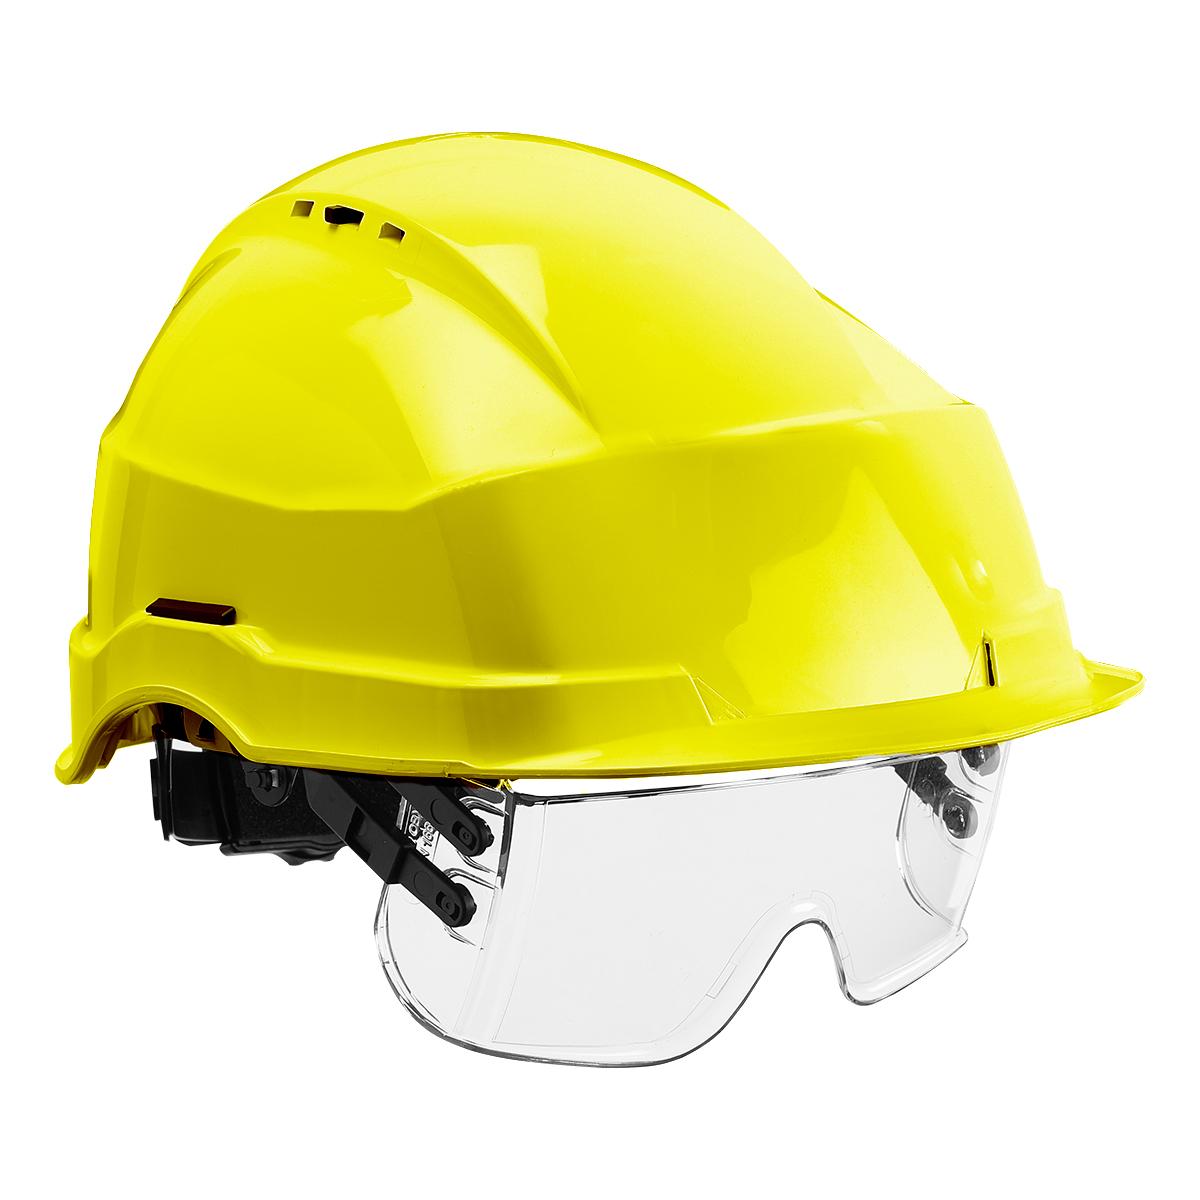 HF0510_Iris II Safety Helmet and Visor_Yellow